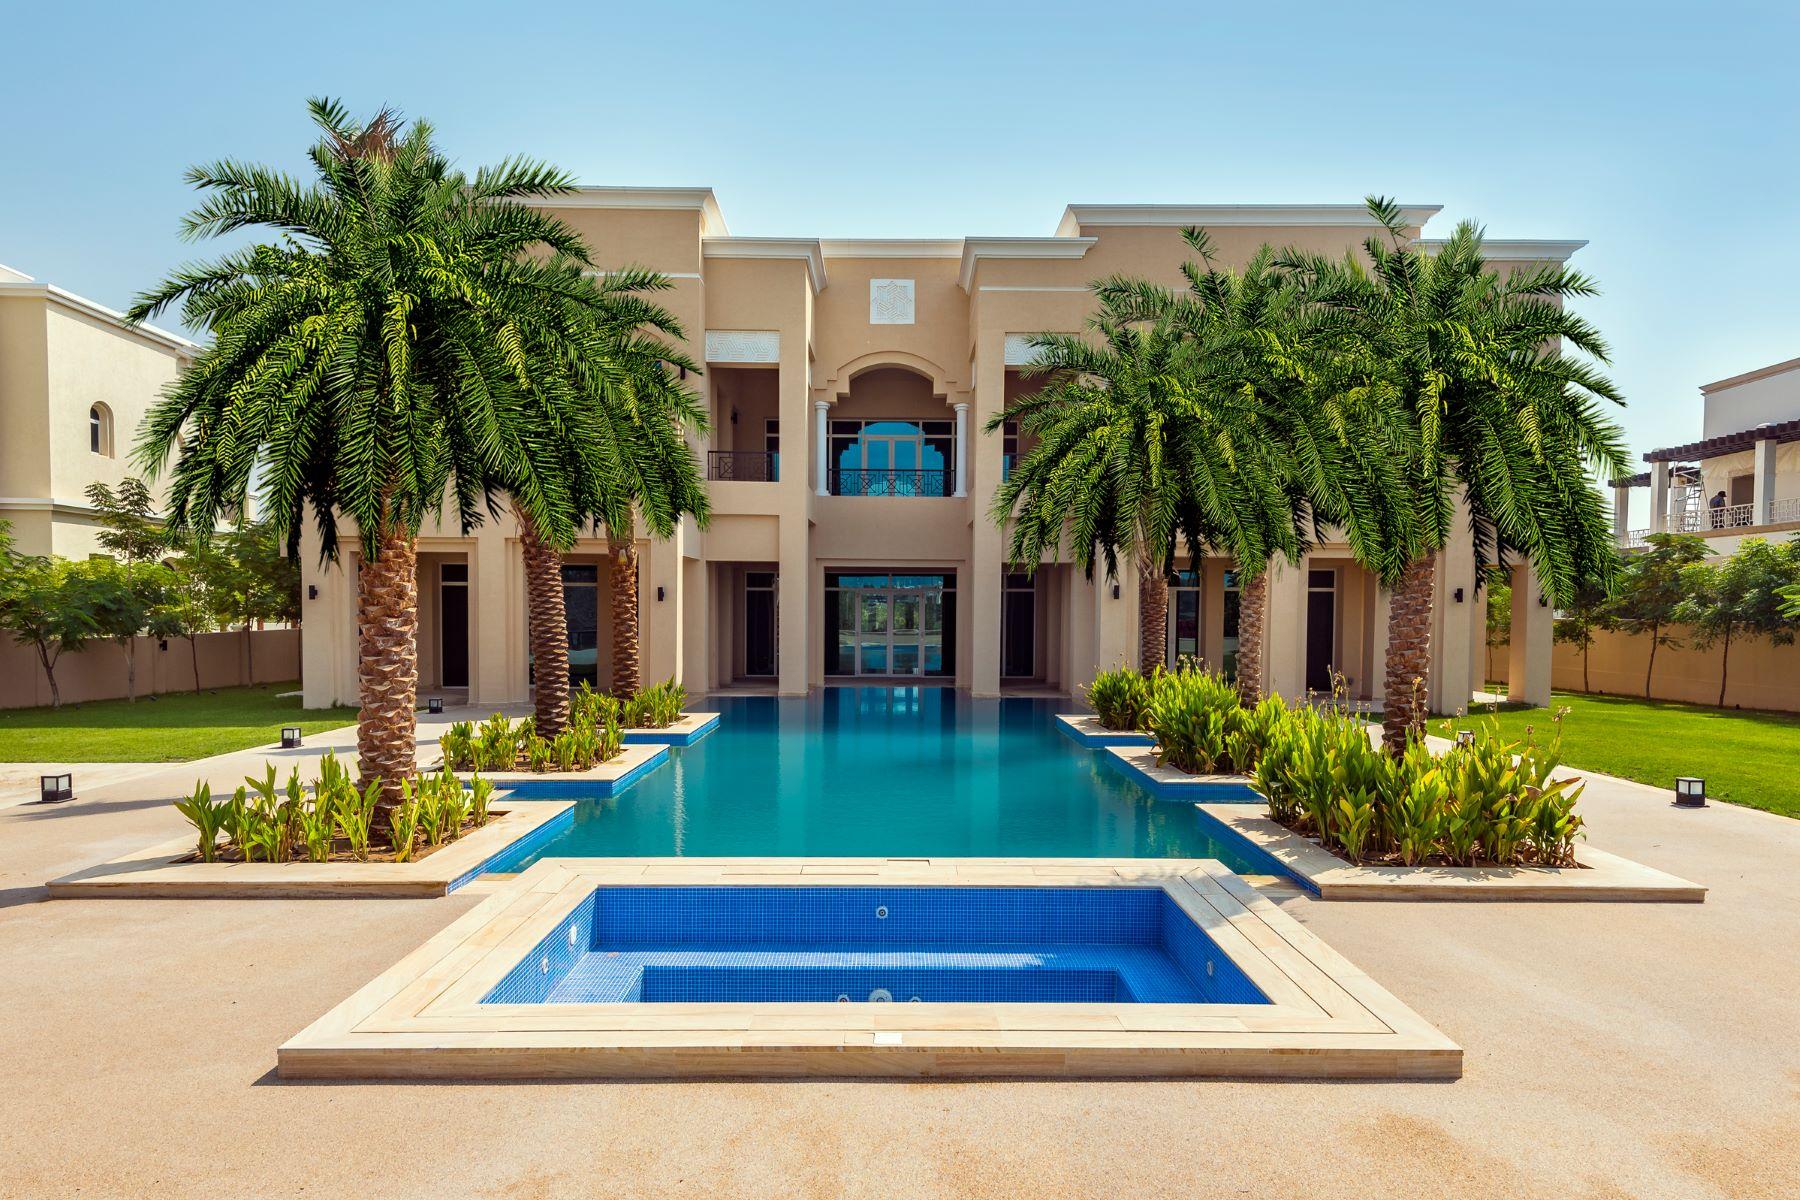 Single Family Home for Sale at Beautifully Created Villa Emirates Hills, Dubai, United Arab Emirates